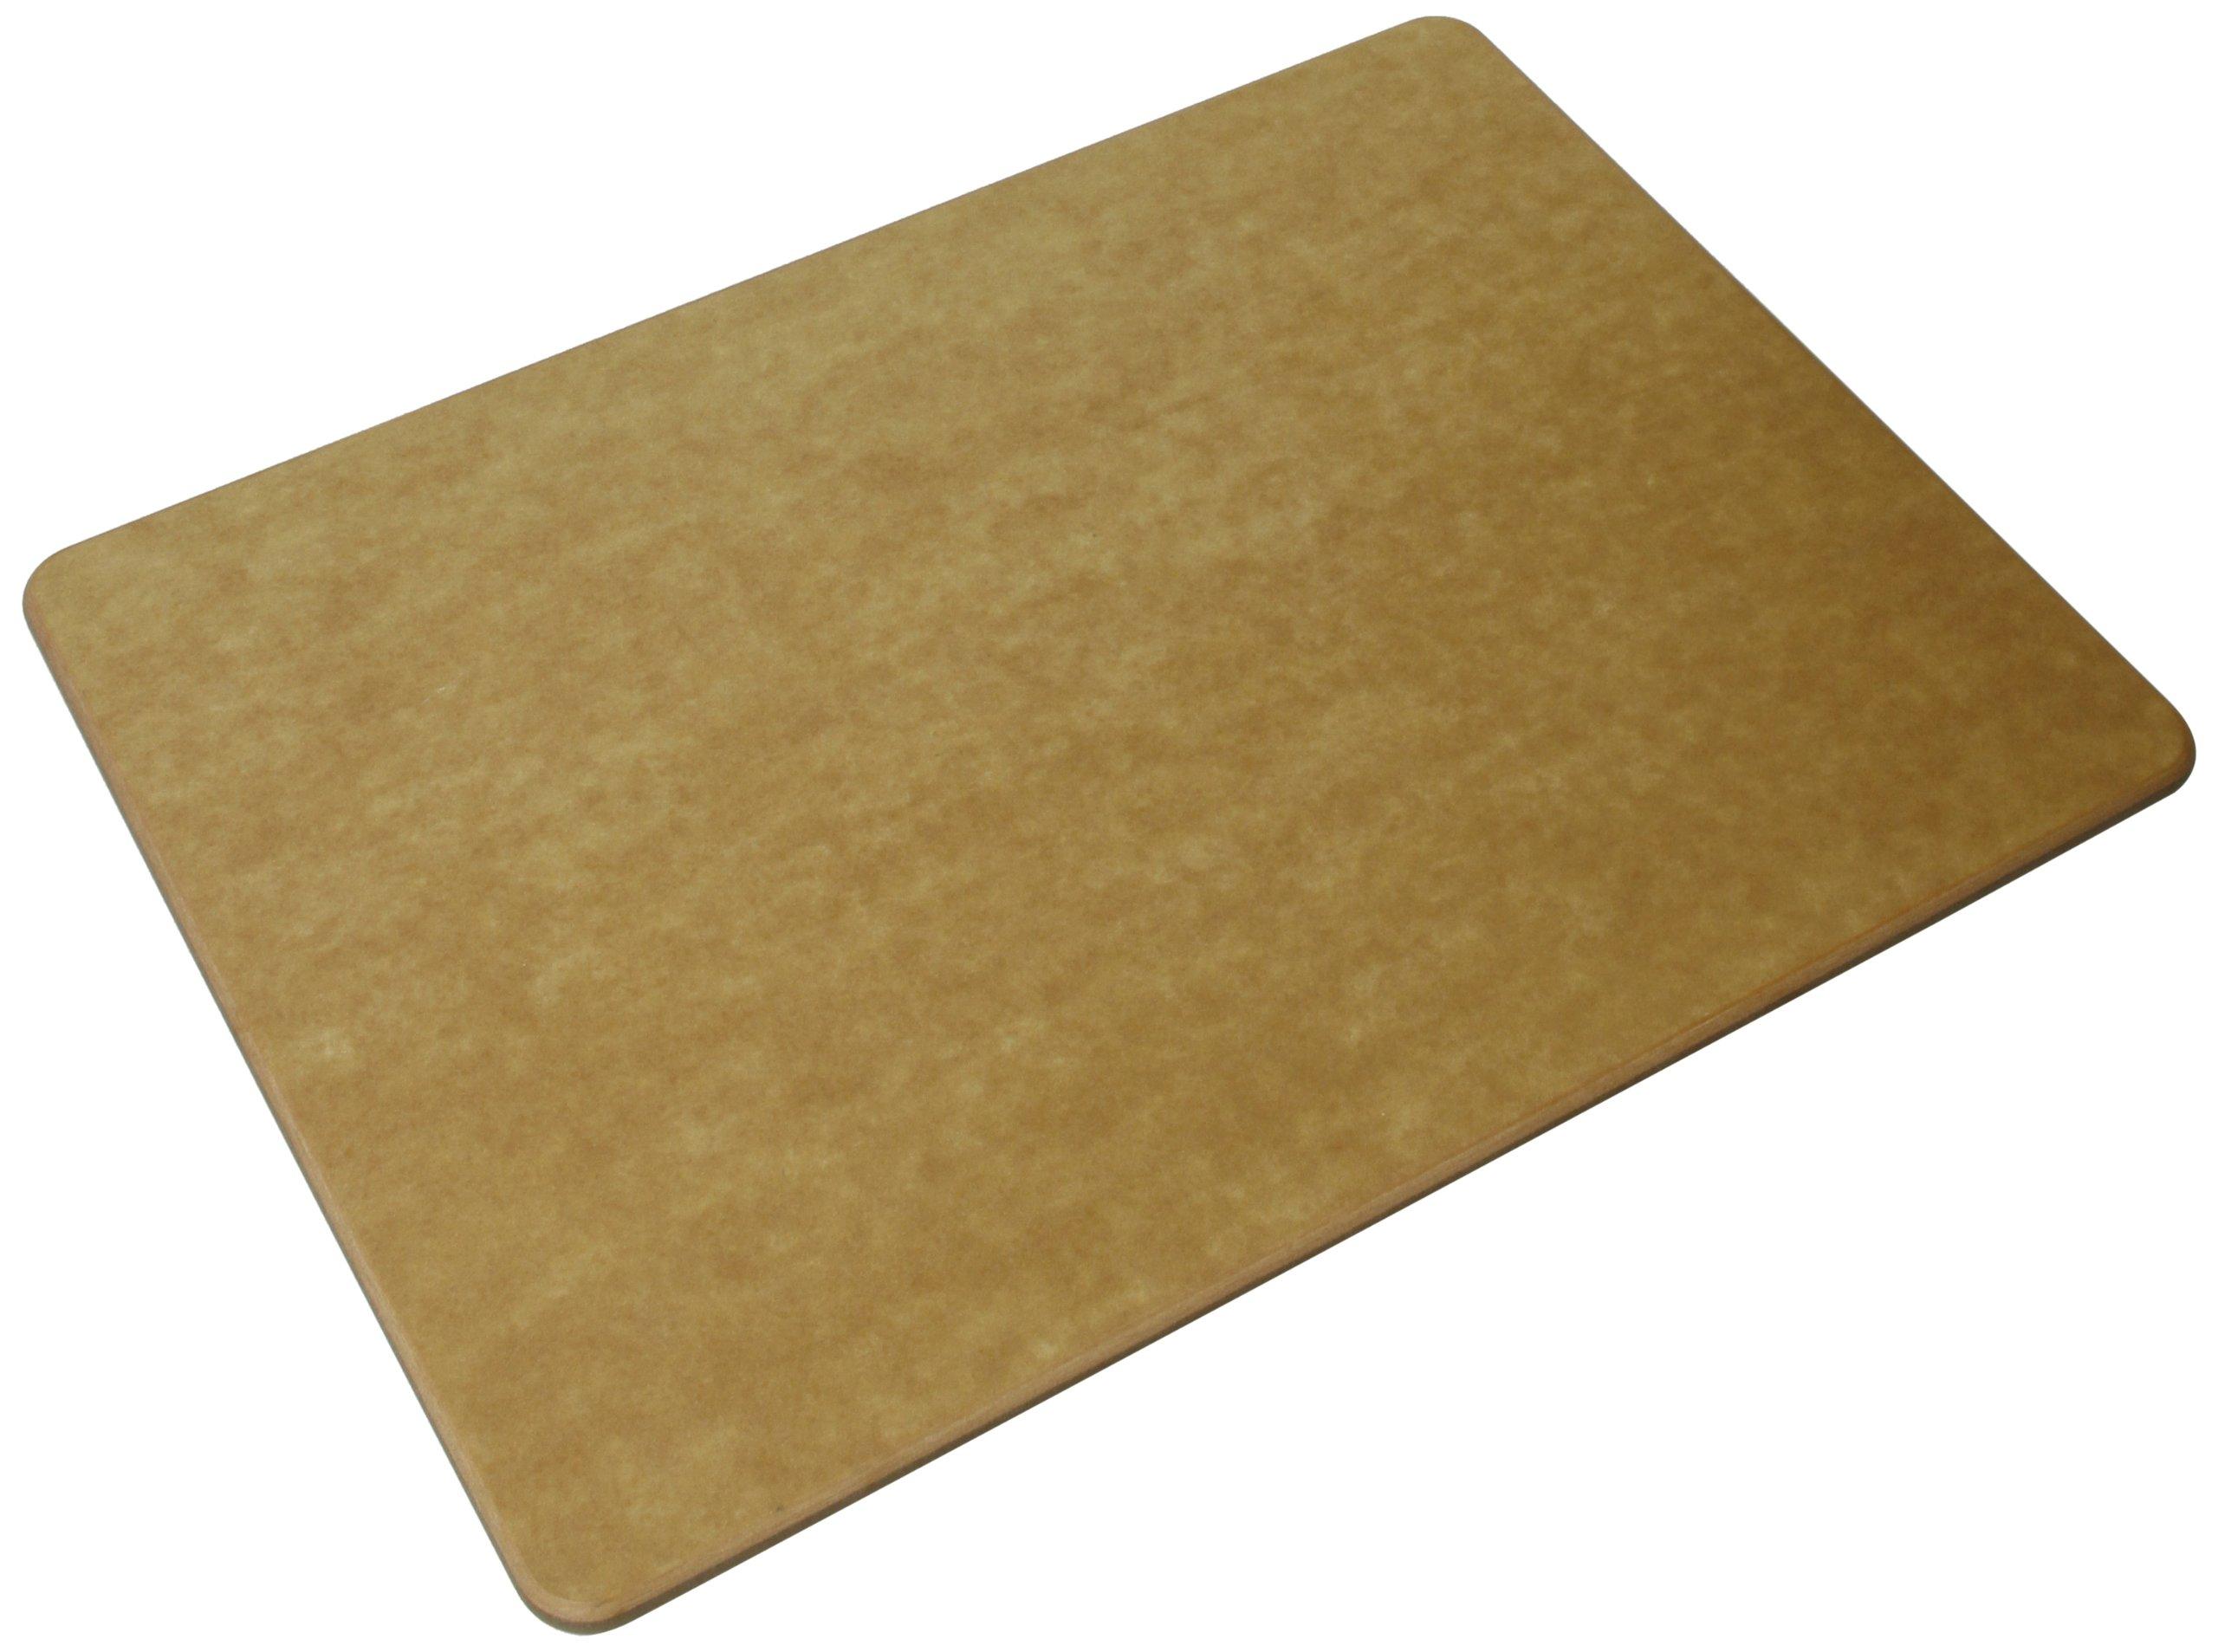 San Jamar TC152012 Tuff-Cut High Tech Resin Regular Cutting Board, 20'' Width x 15'' Height x 1/2'' Depth